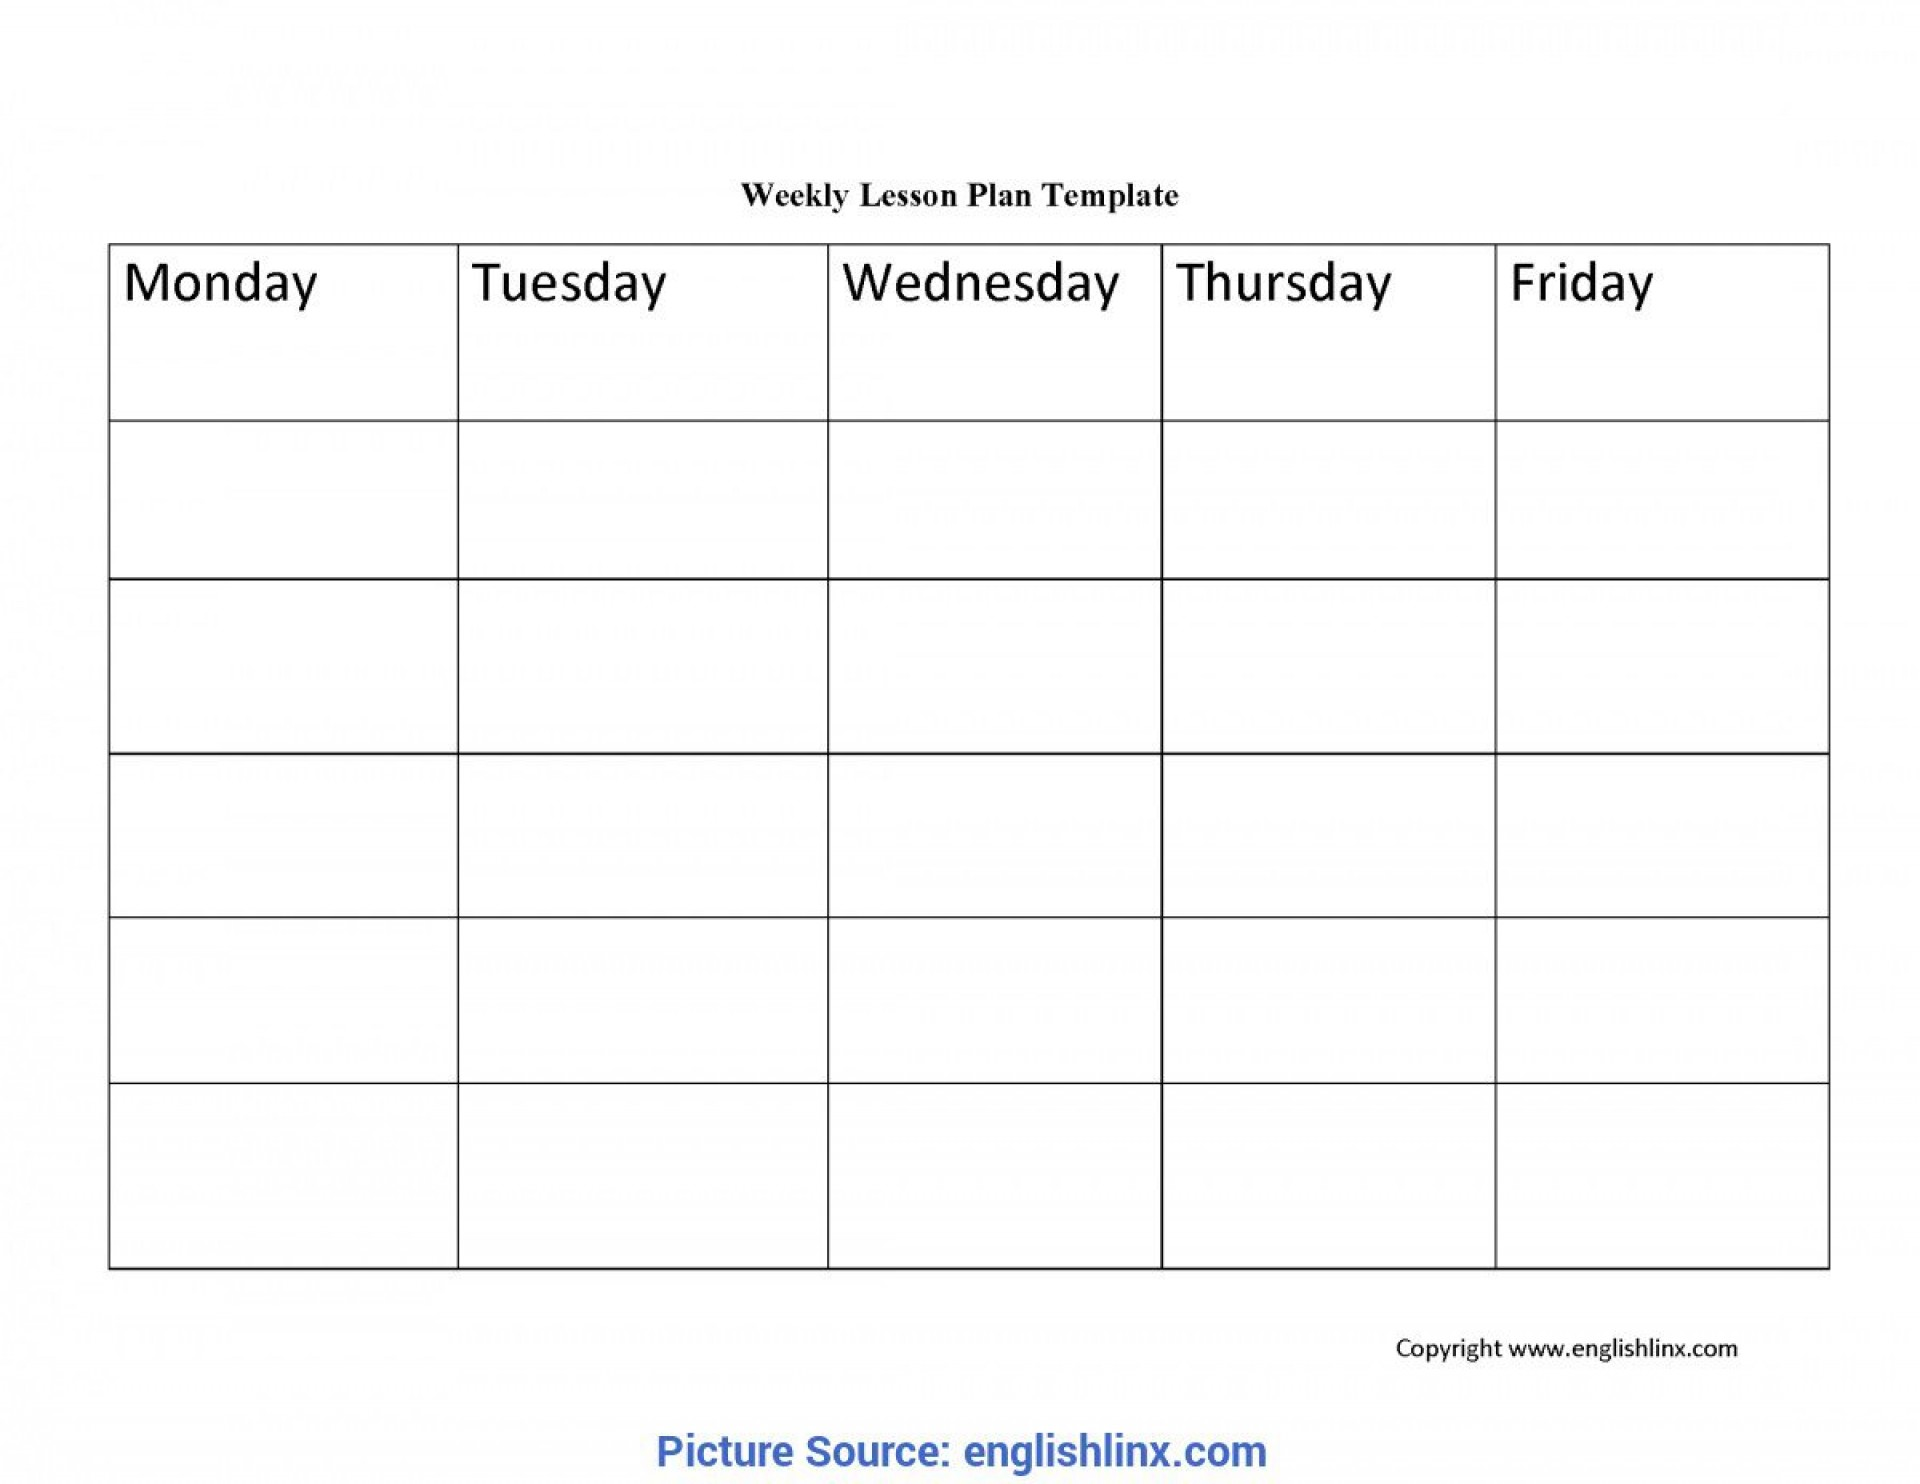 004 Rare Blank Weekly Lesson Plan Template High Def  Printable Pdf Free Editable1920